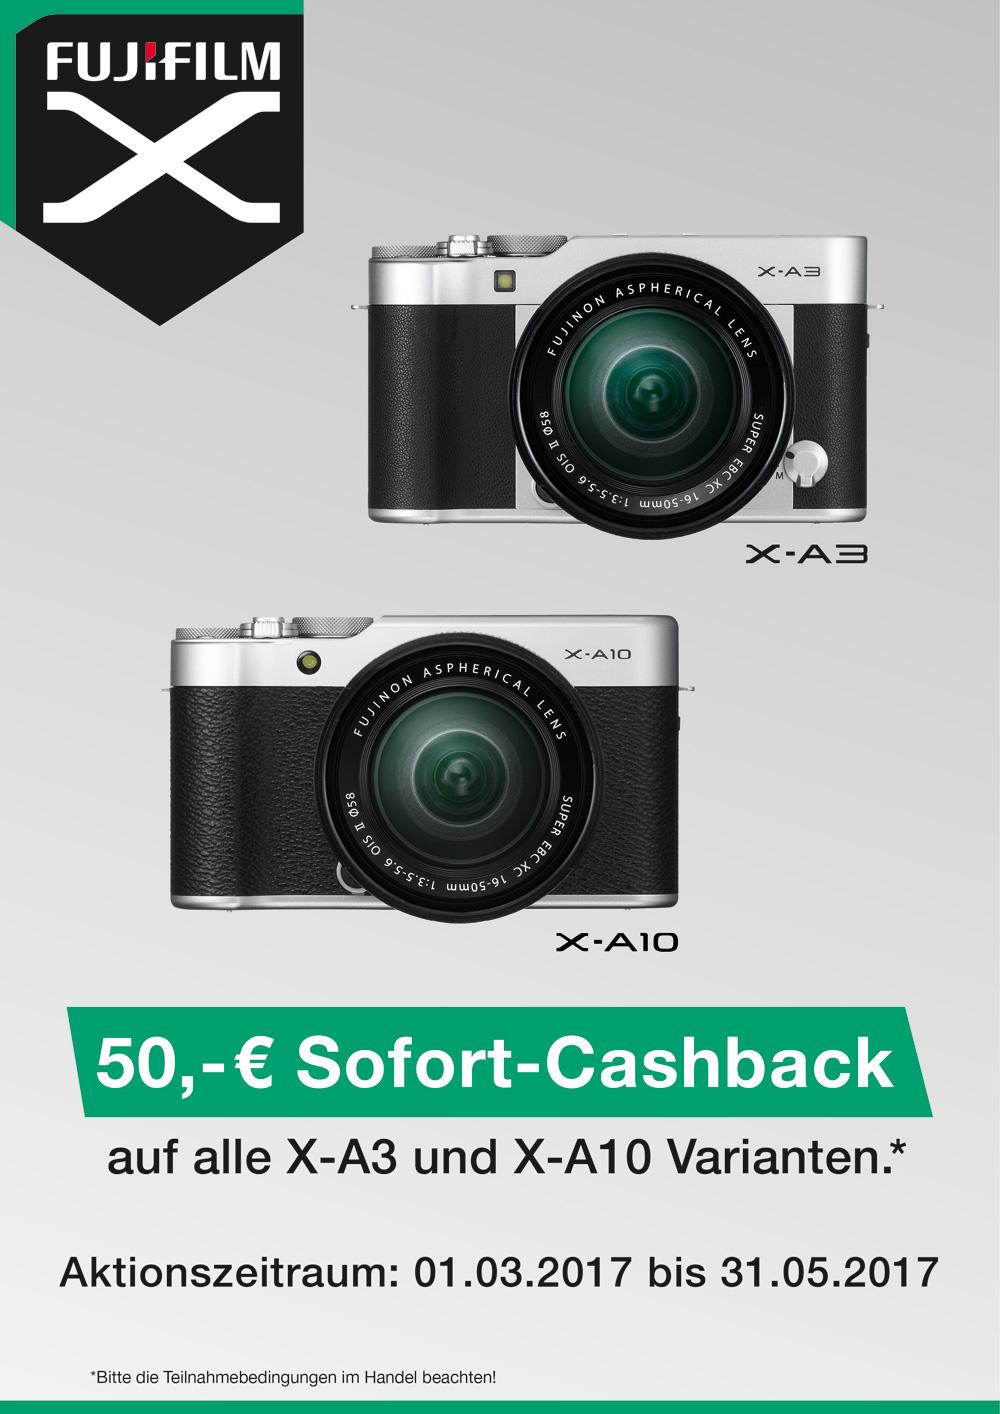 Fujifilm Sofortcashback